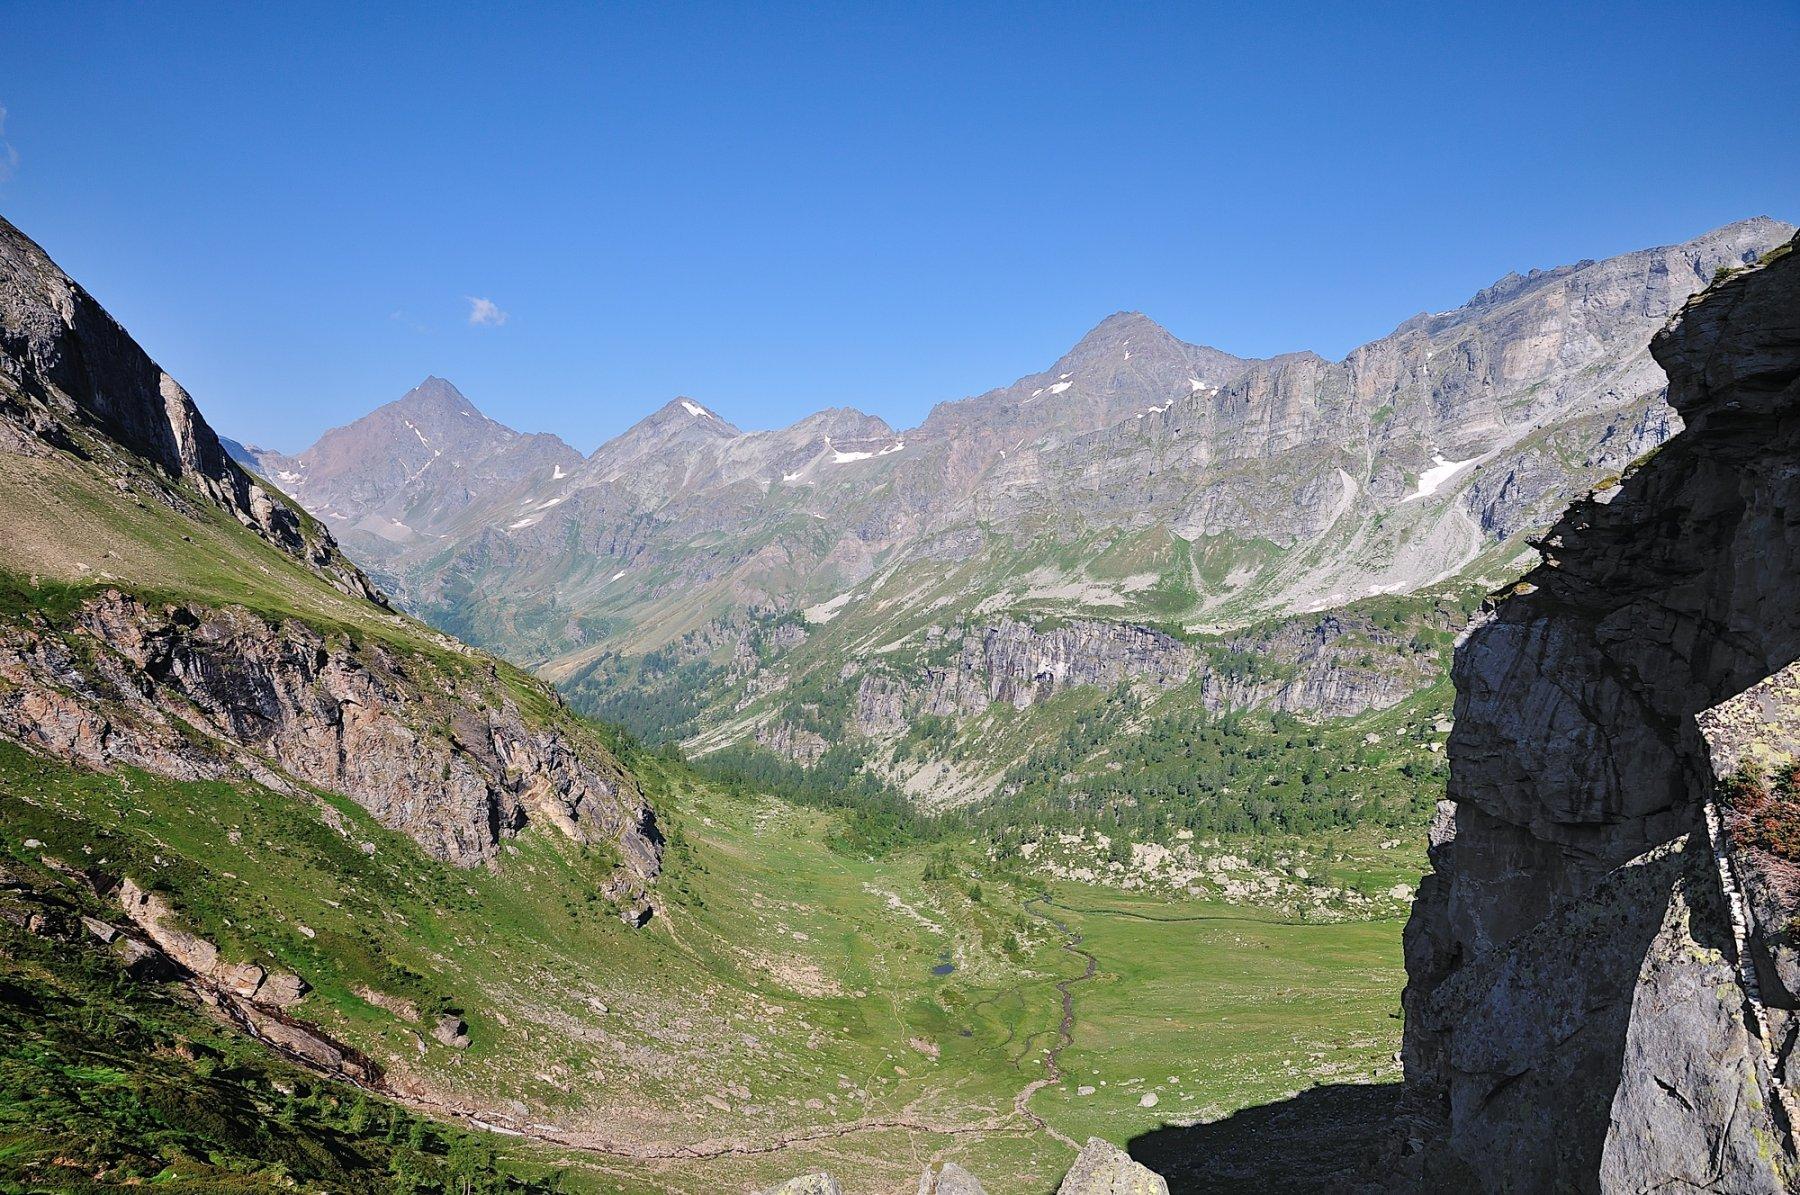 Vista sul Pian Sas Mor salendo al Passo di Valtendra